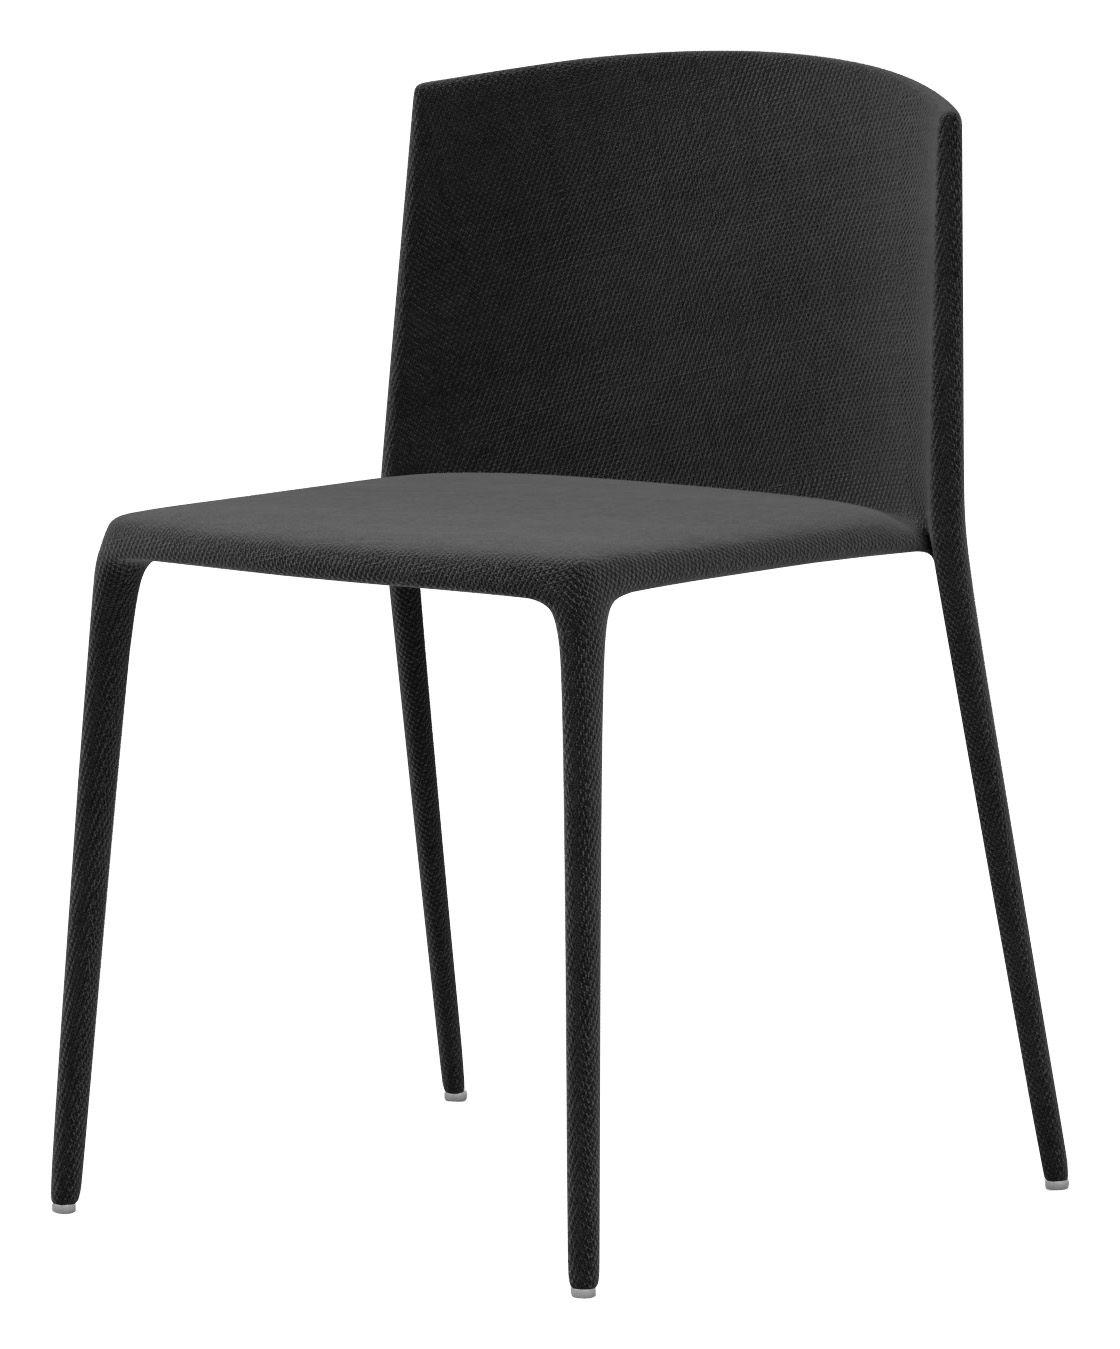 chaise rembourr e achille noir mdf italia. Black Bedroom Furniture Sets. Home Design Ideas